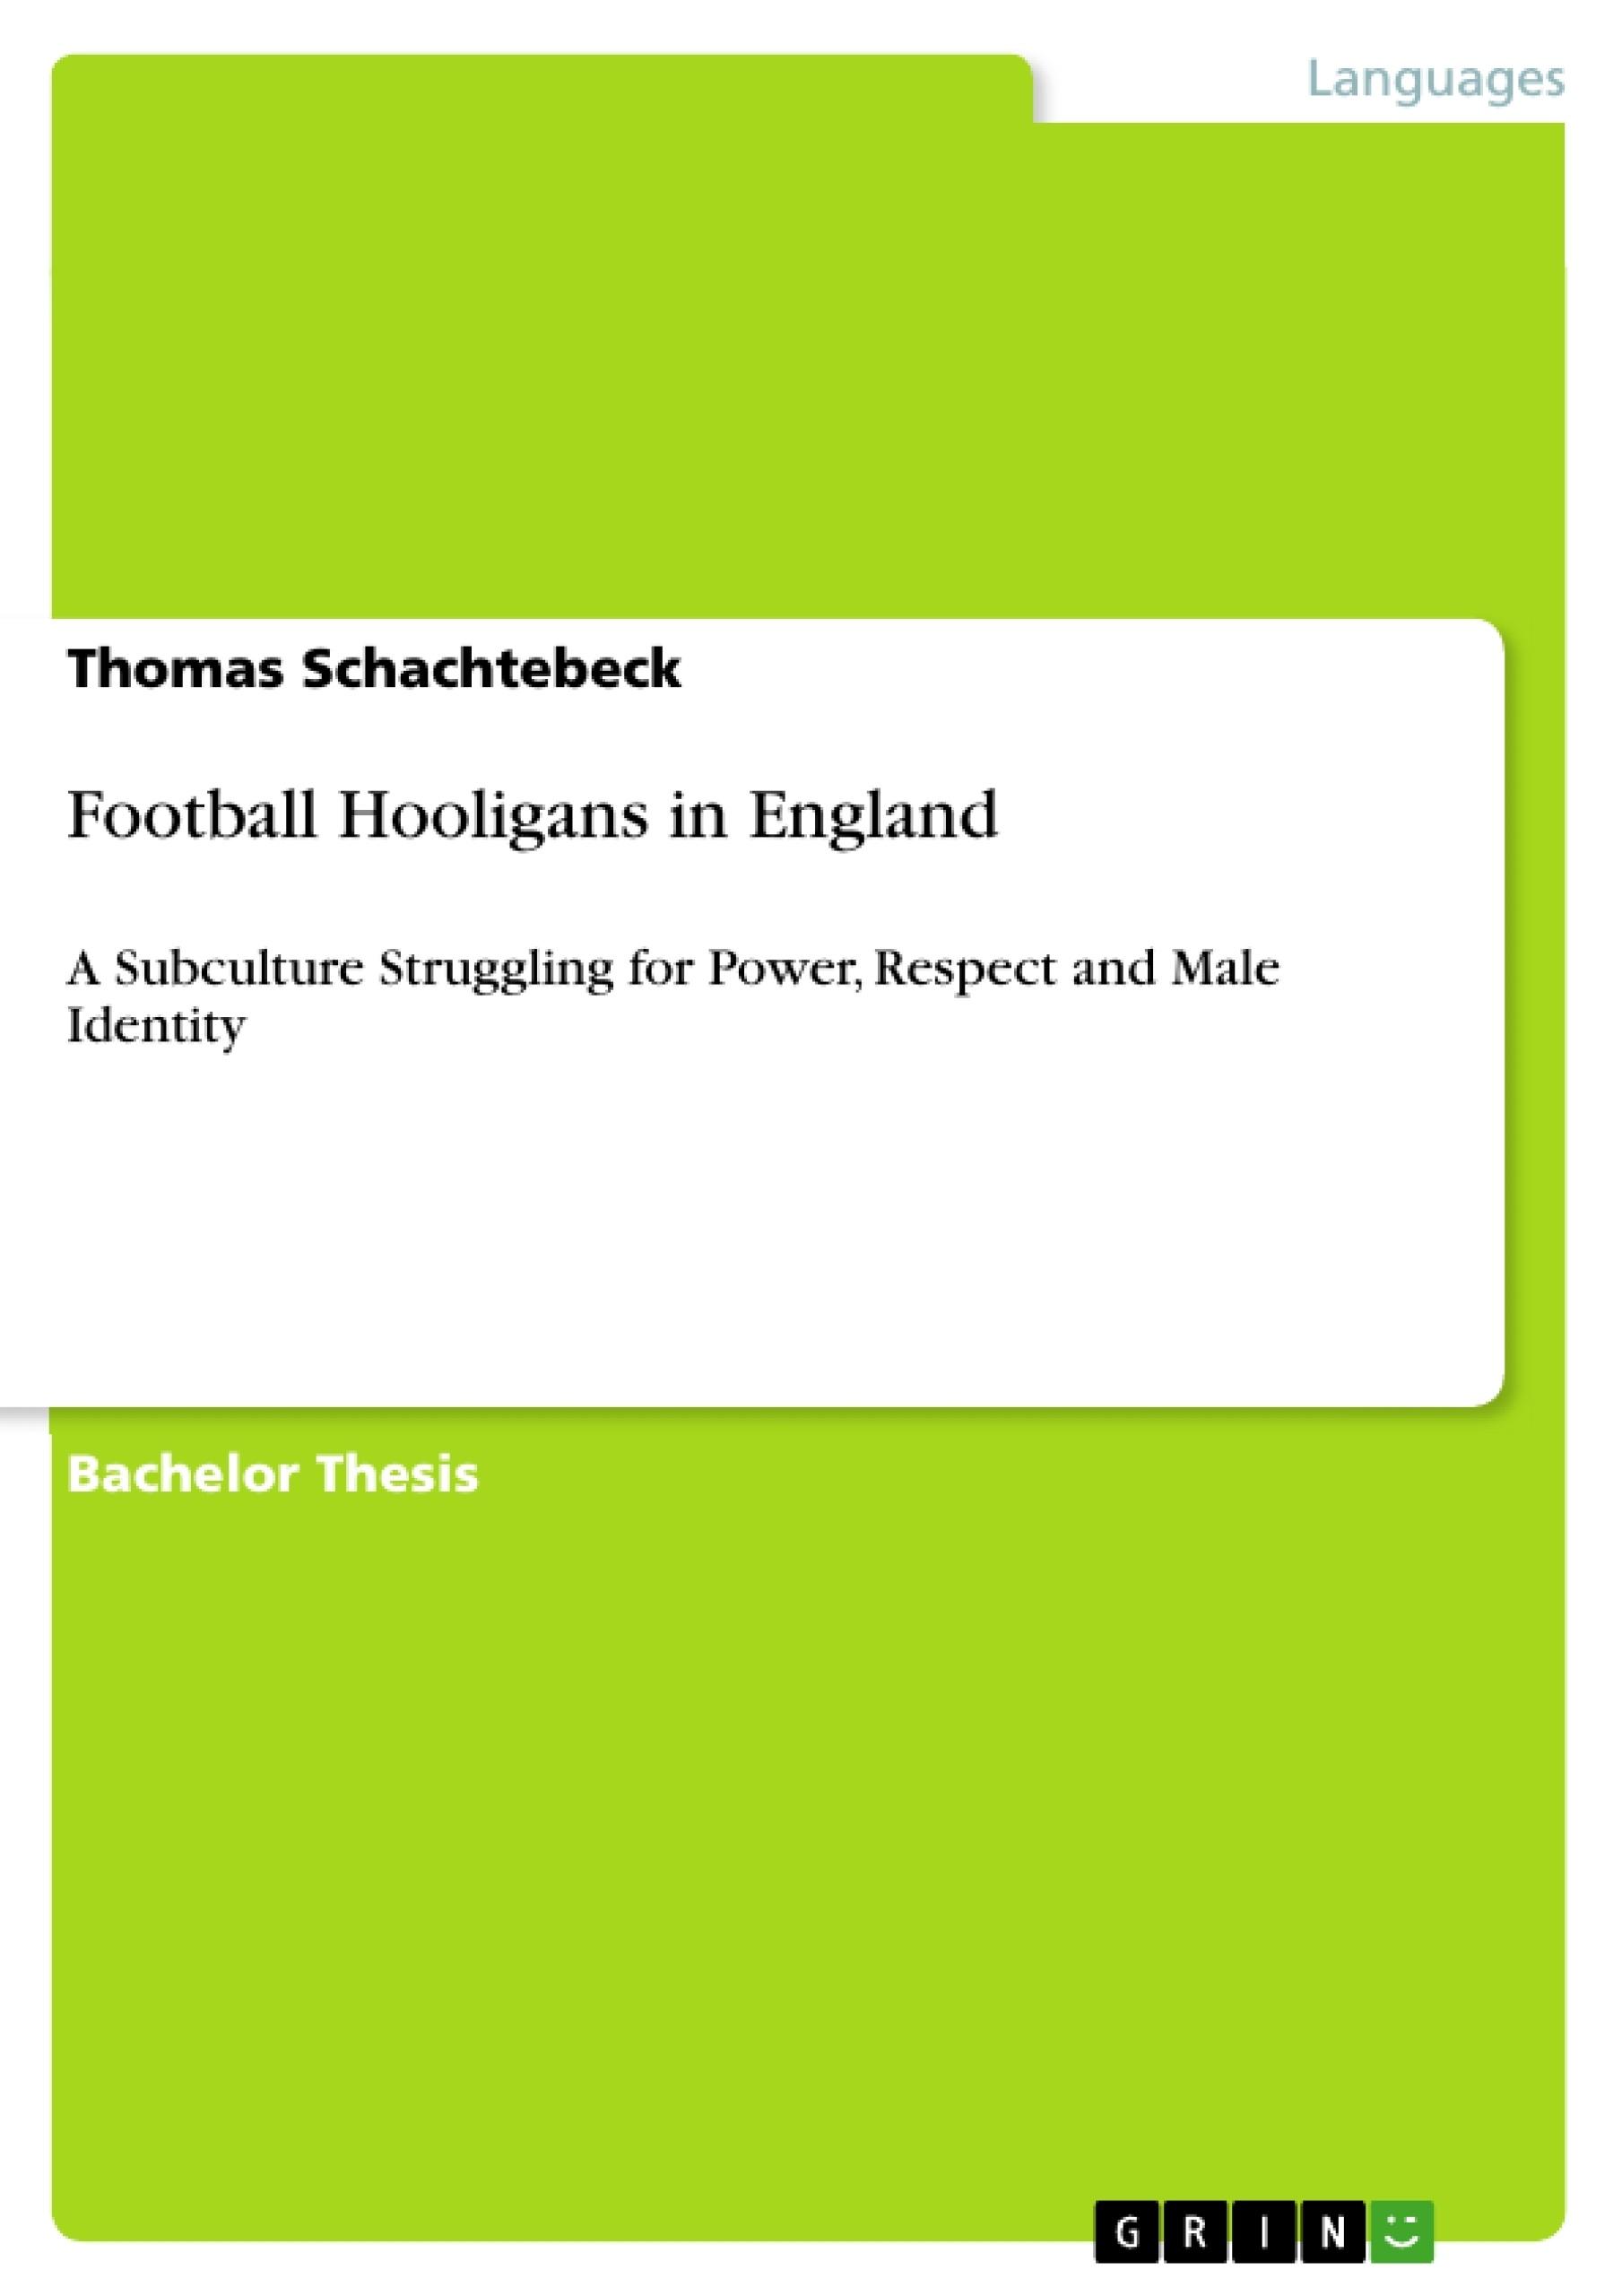 Title: Football Hooligans in England